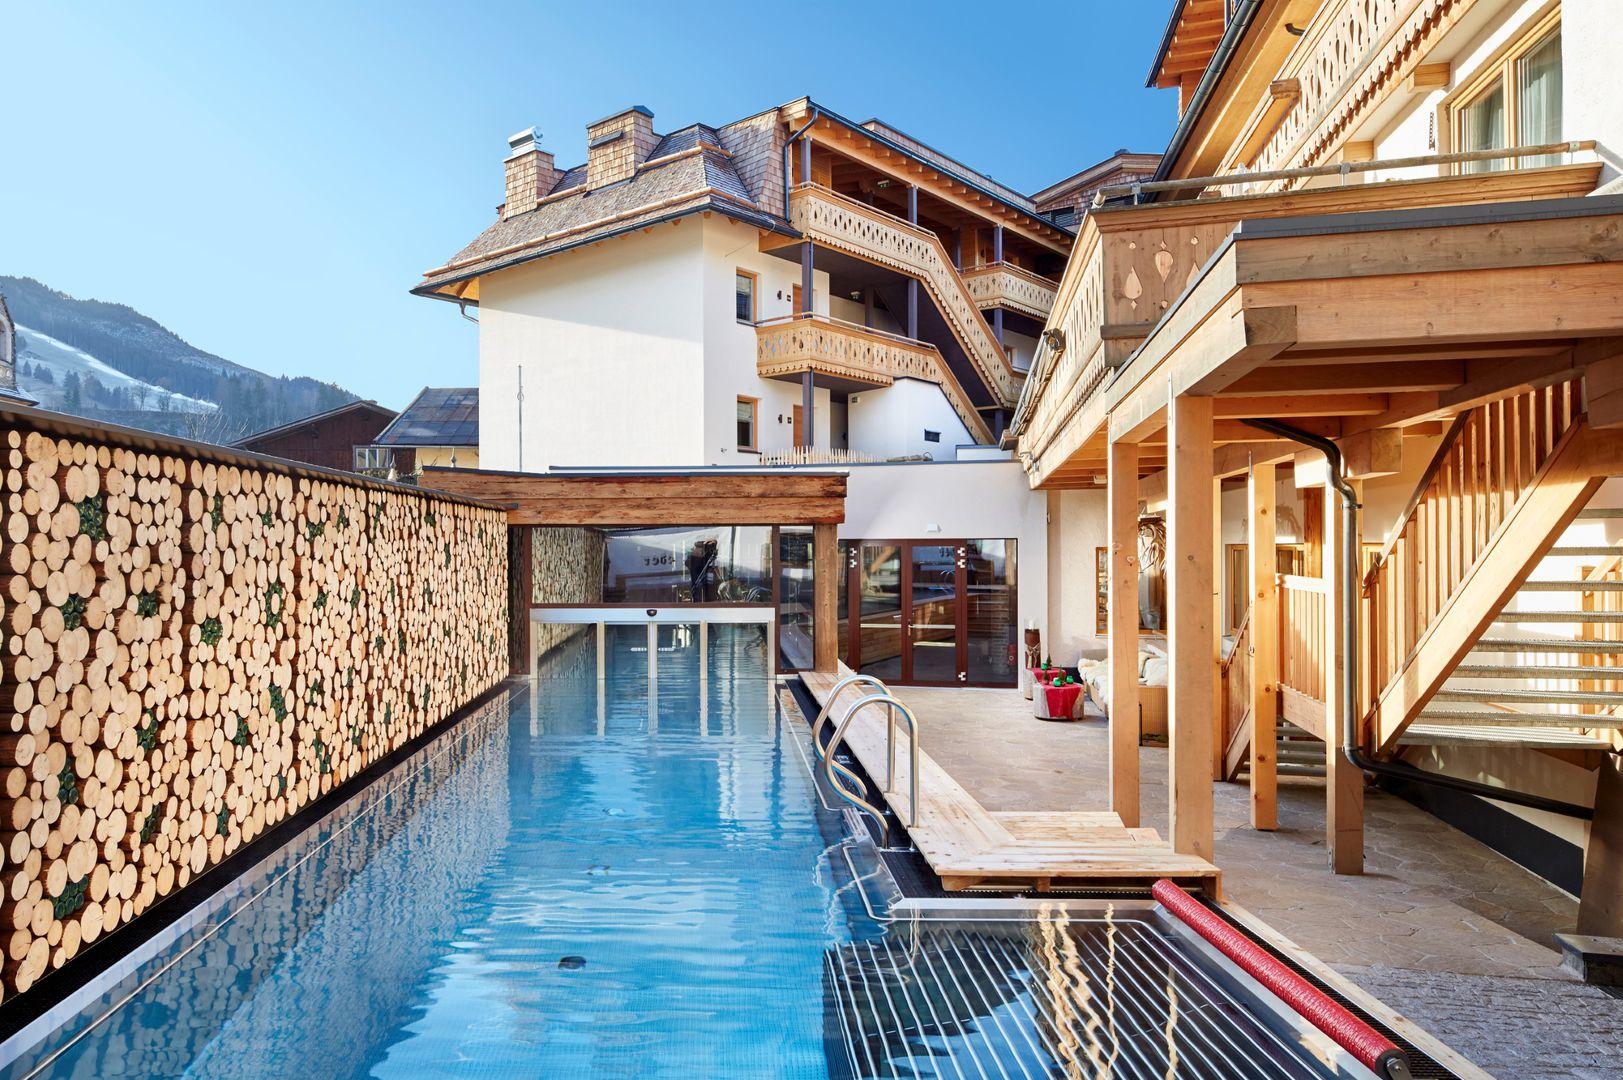 Eder - Hotel Hochkönig Lifetime